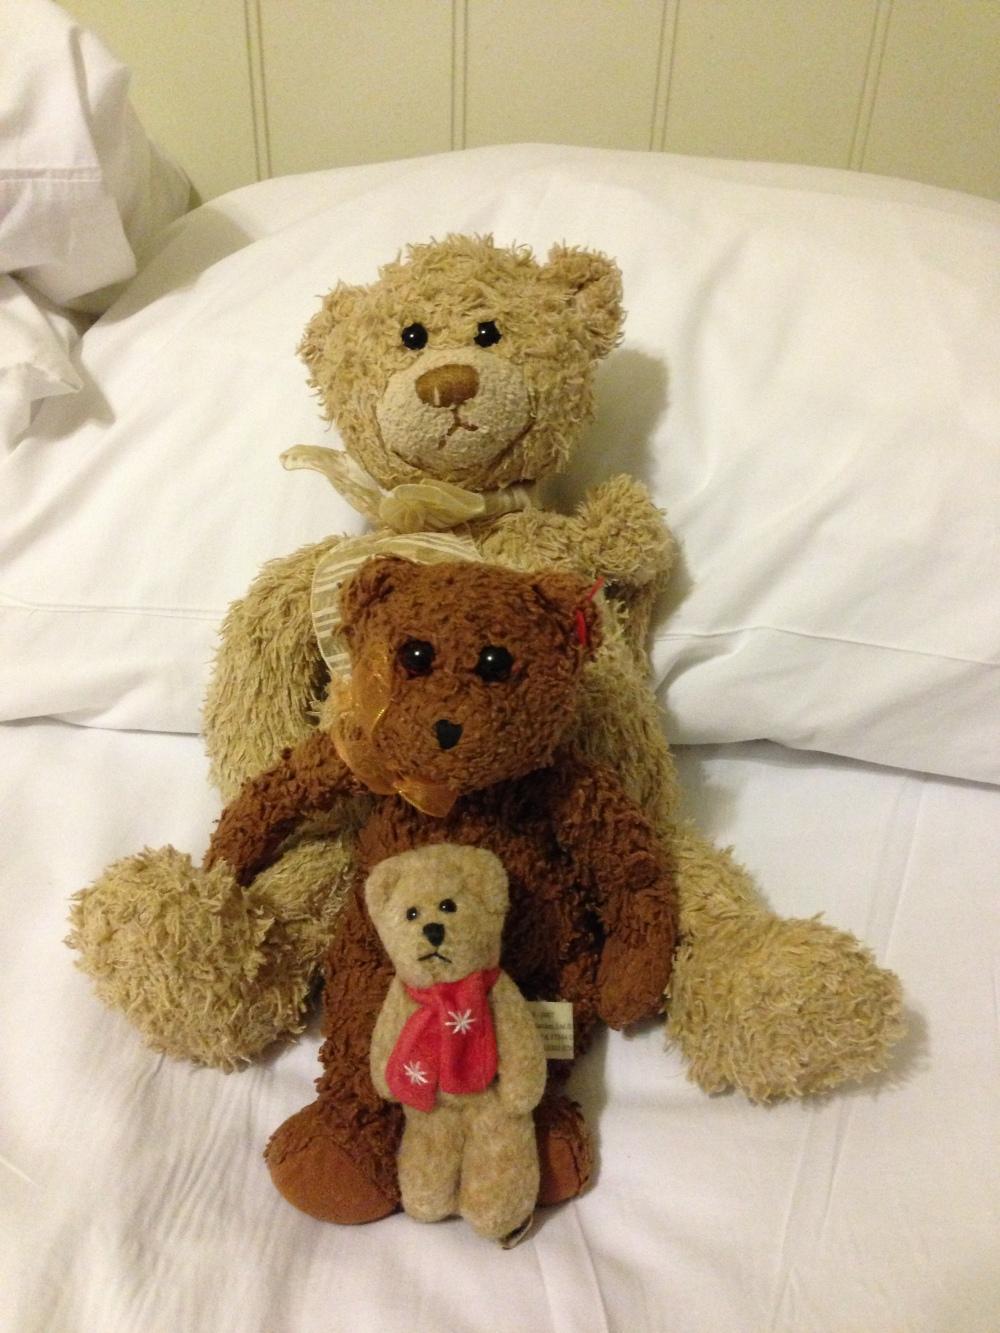 The bears.JPG